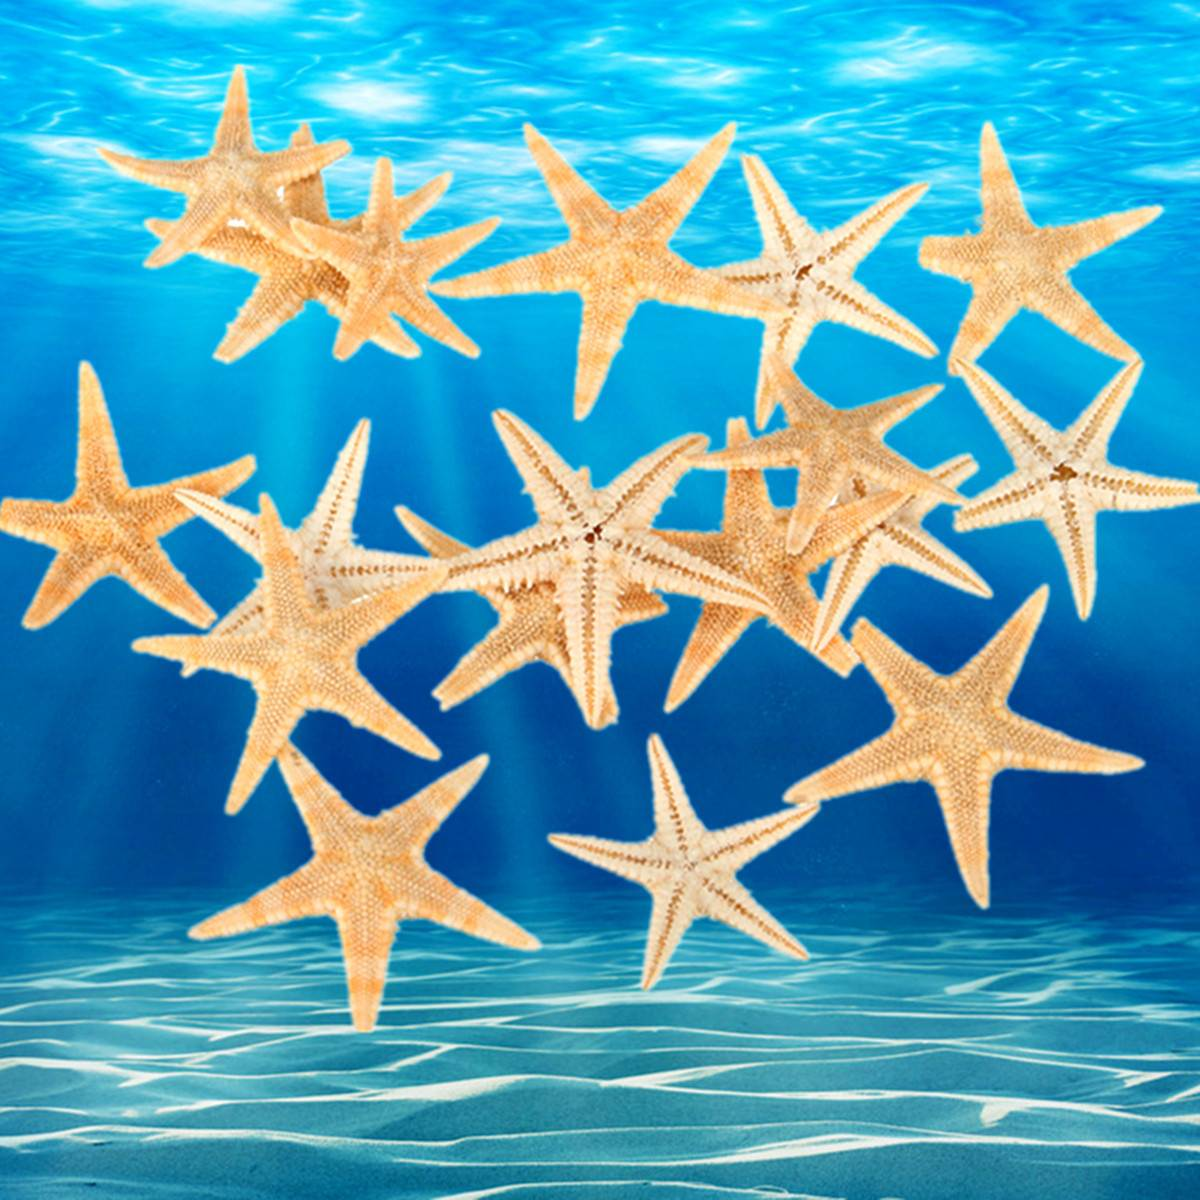 20pcs/set 1.5-2.0cm Natural Sea Star Ocean Sea Animal Fish For Micro Landscape Terrarium Decorative Ornament Crafts